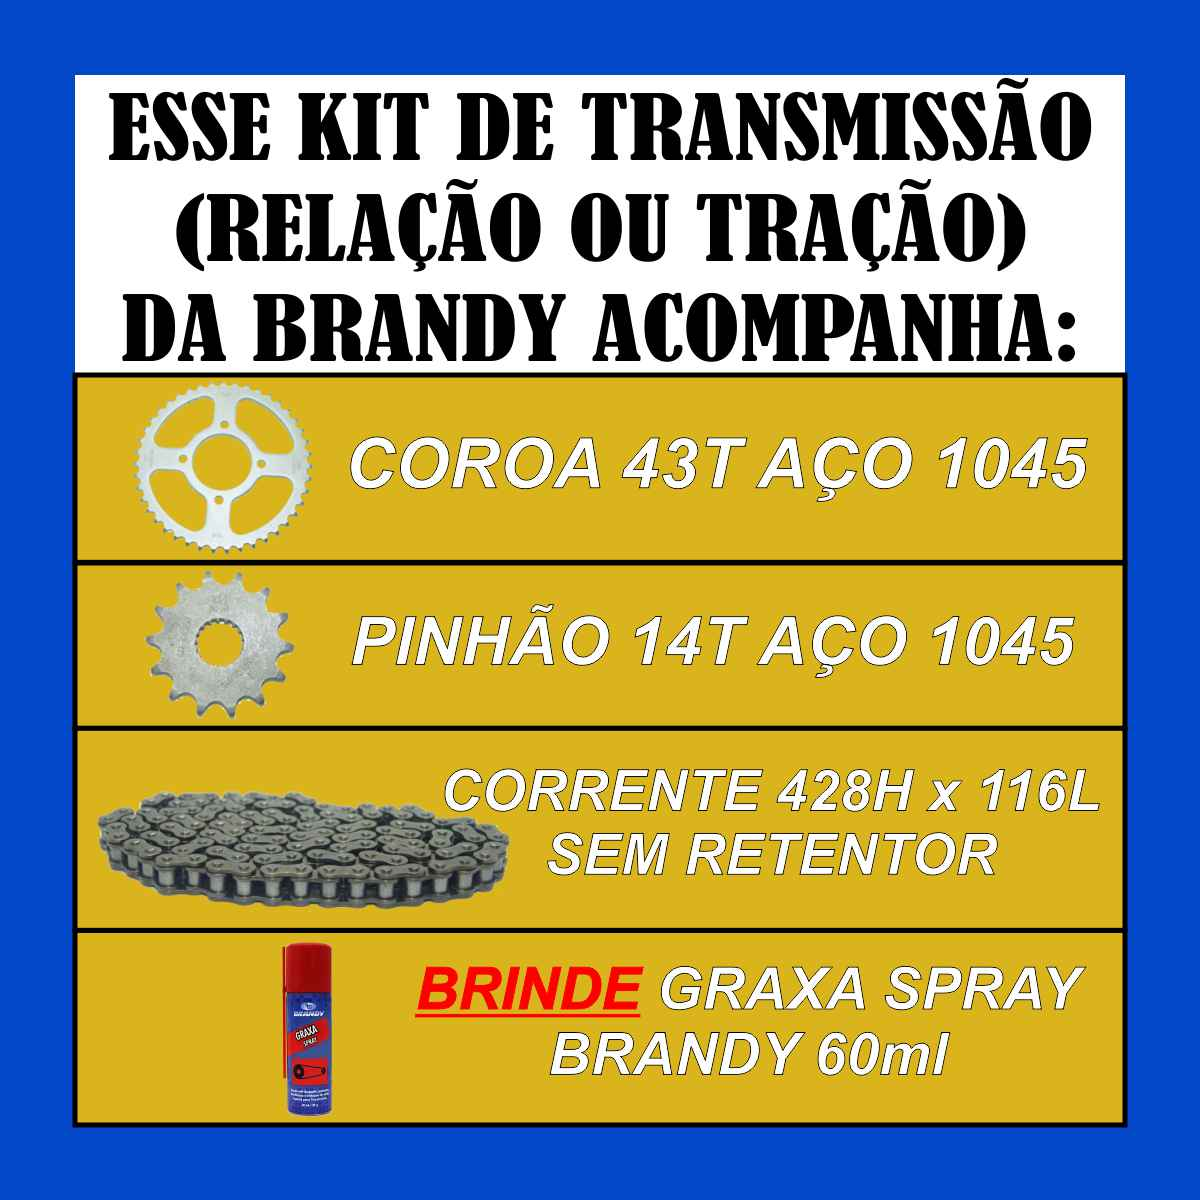 KIT RELAÇÃO TRANSMISSÃO REFORÇADA MOTO SUZUKI EN 125 YES SE TRAÇÃO + GRAXA LUBRIFICANTE SPRAY 60ml